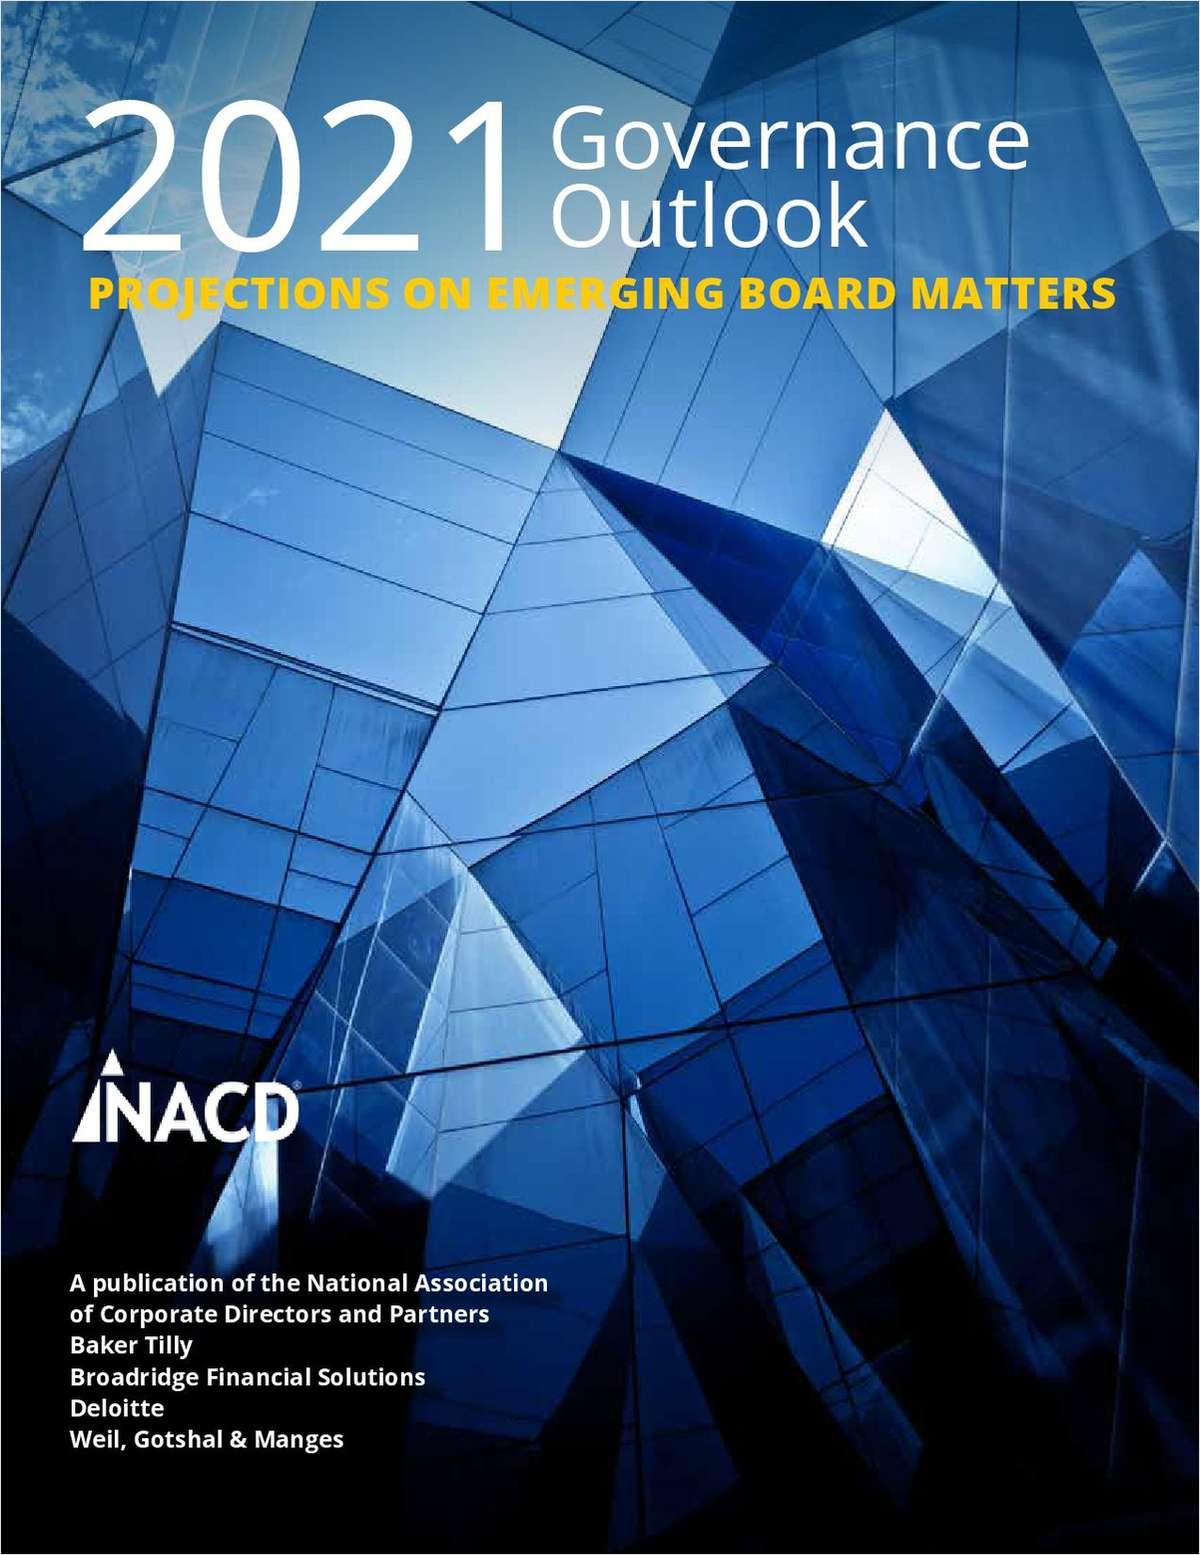 2021 Governance Outlook Report